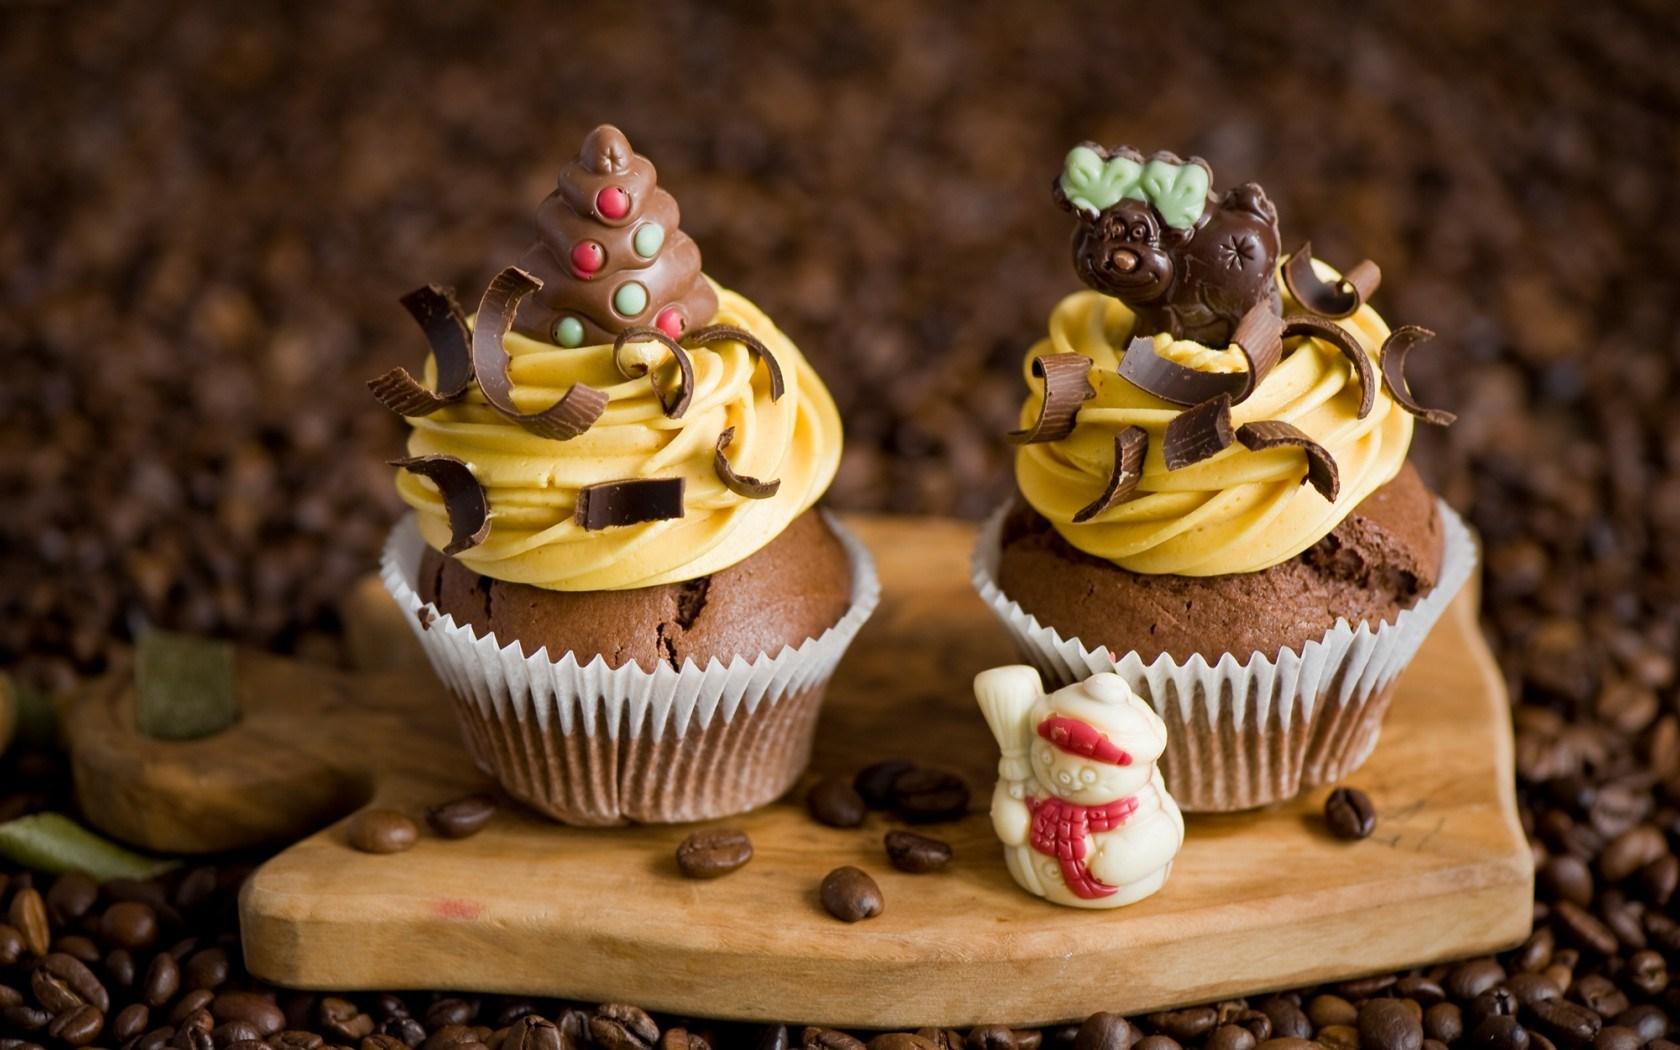 Cupcakes Cream Chocolate Snowman Christmas Tree Deer Dessert